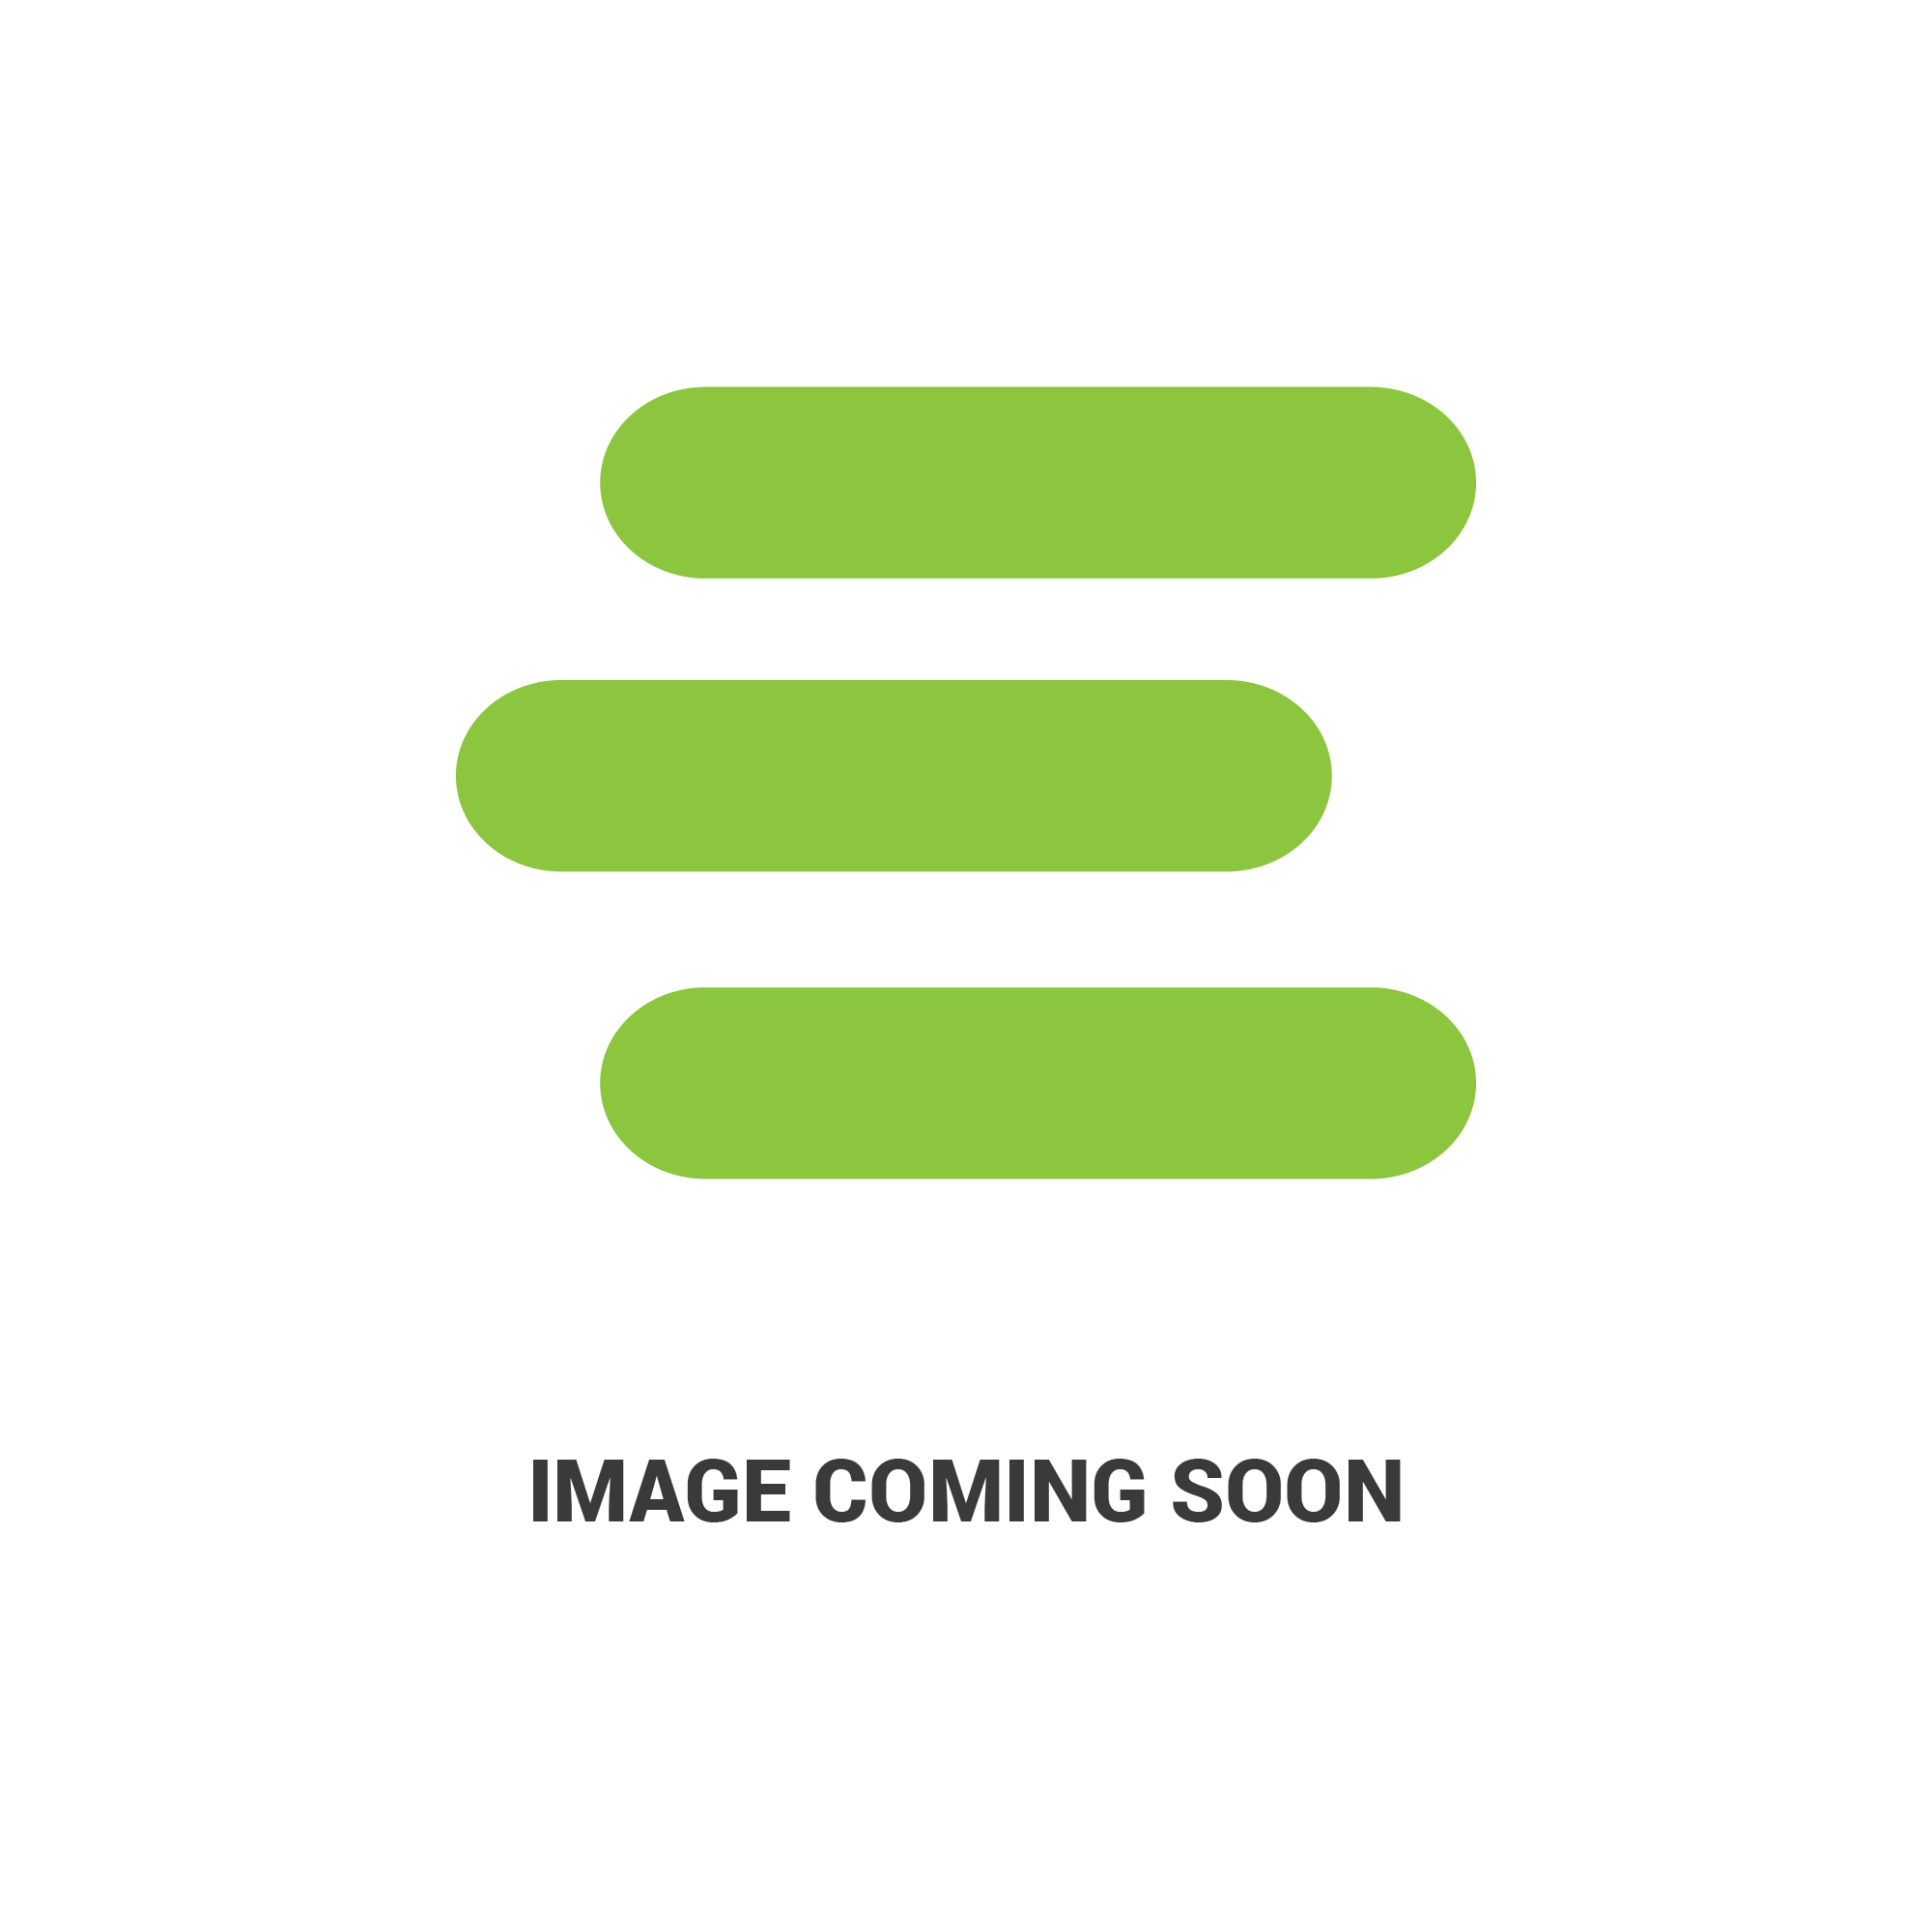 E-7102447edit 1.jpg